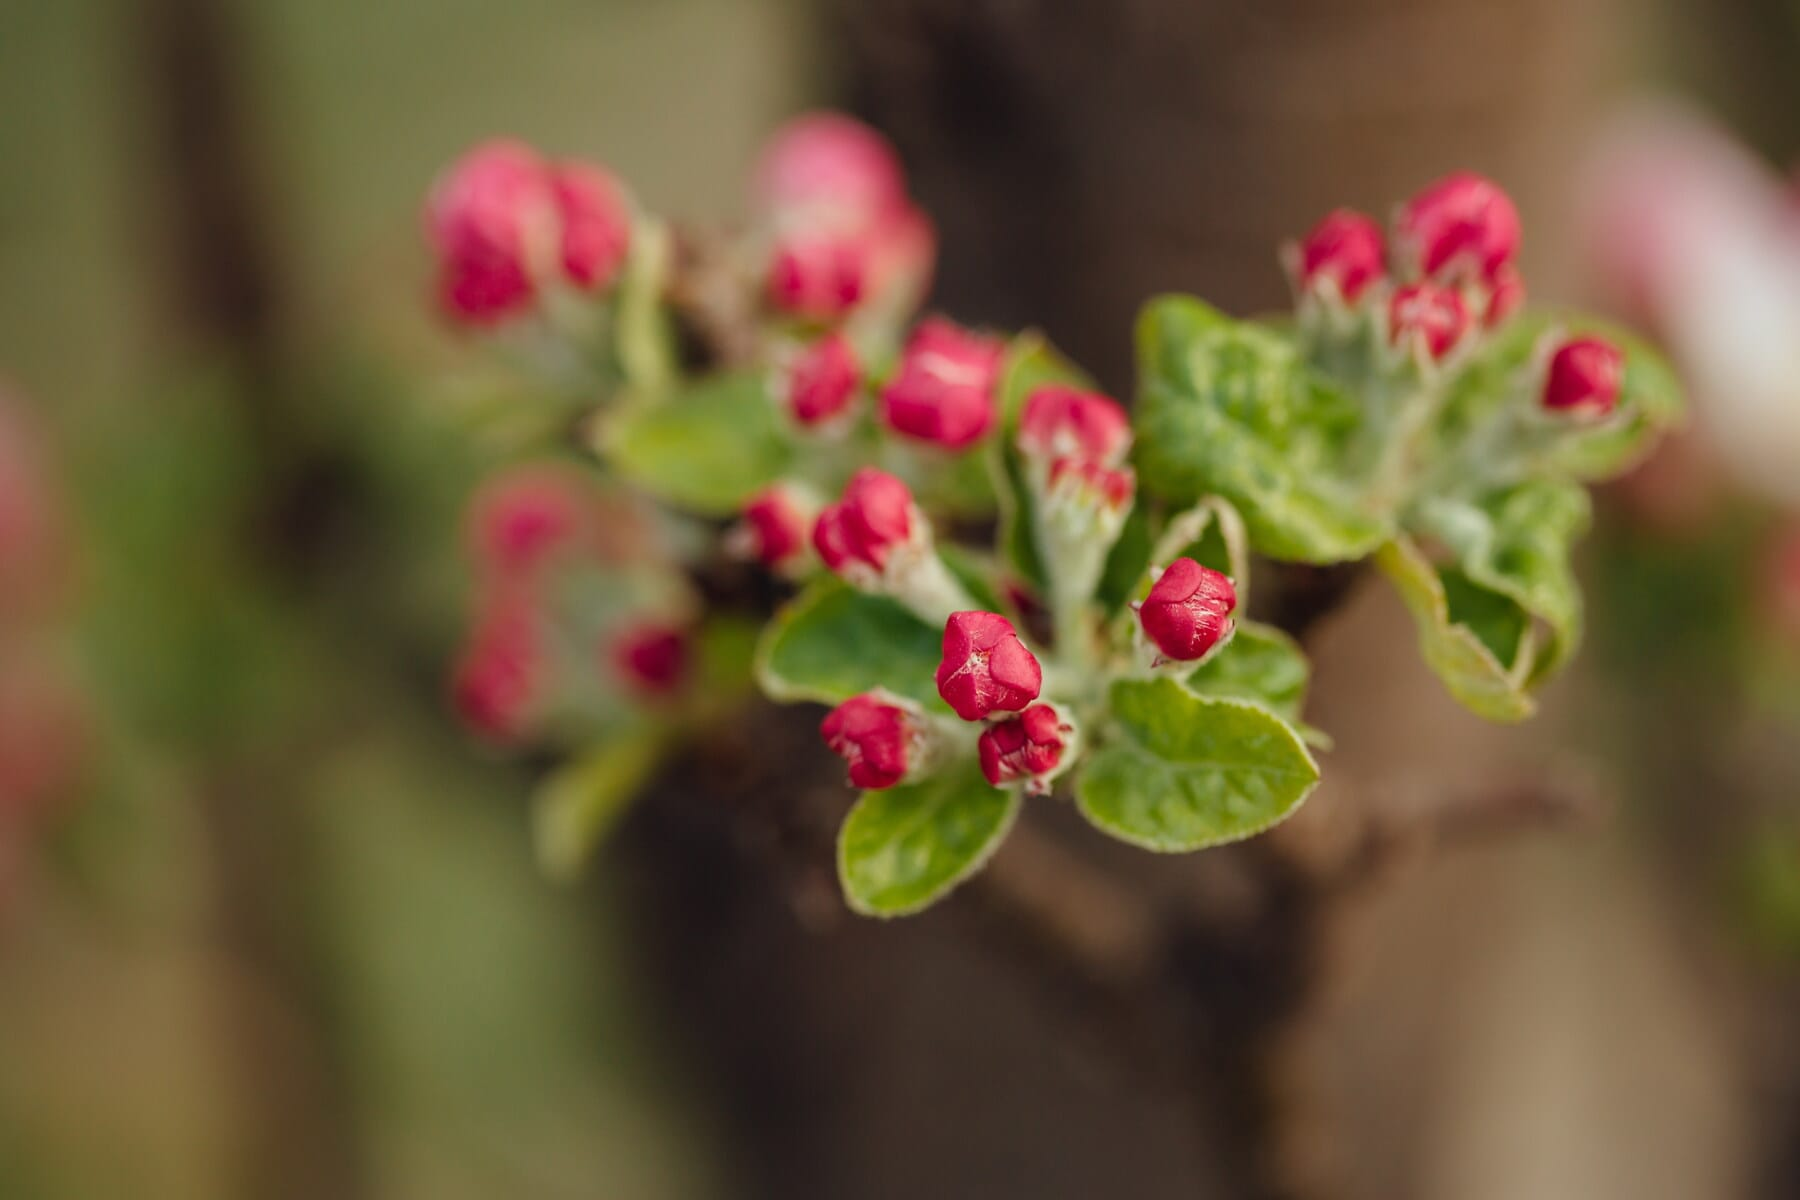 Obstbaum, aus nächster Nähe, Apfelbaum, Frühling, Blüte, Blütenblatt, Blütenknospe, Natur, Anlage, Blume